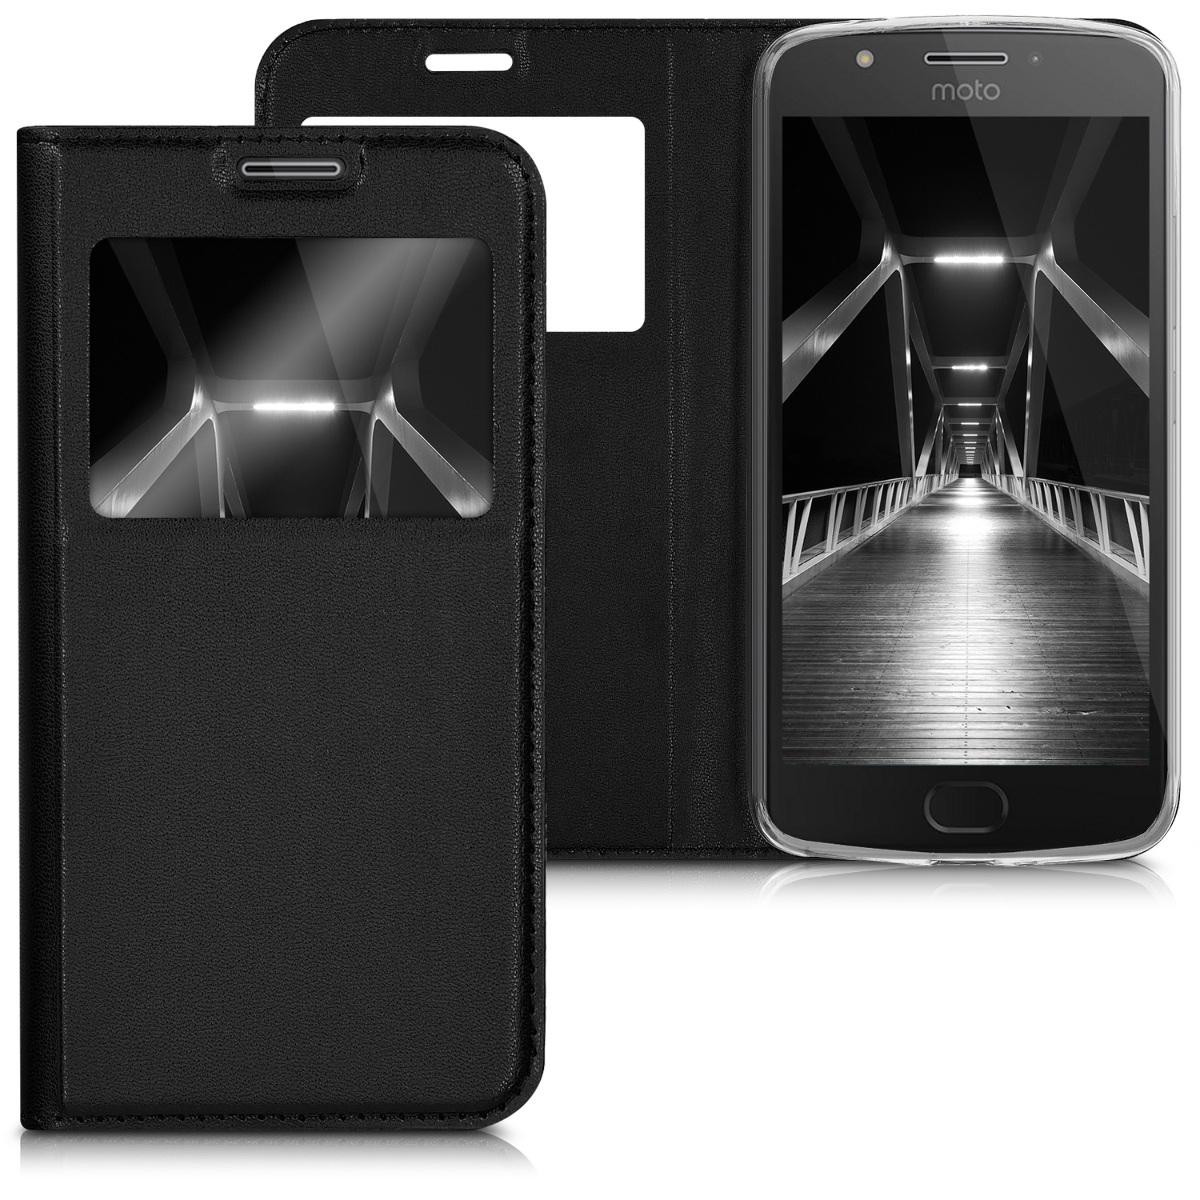 3x folie na display   screenprotector pouzdro   obal pro Motorola Moto E4 - Černá